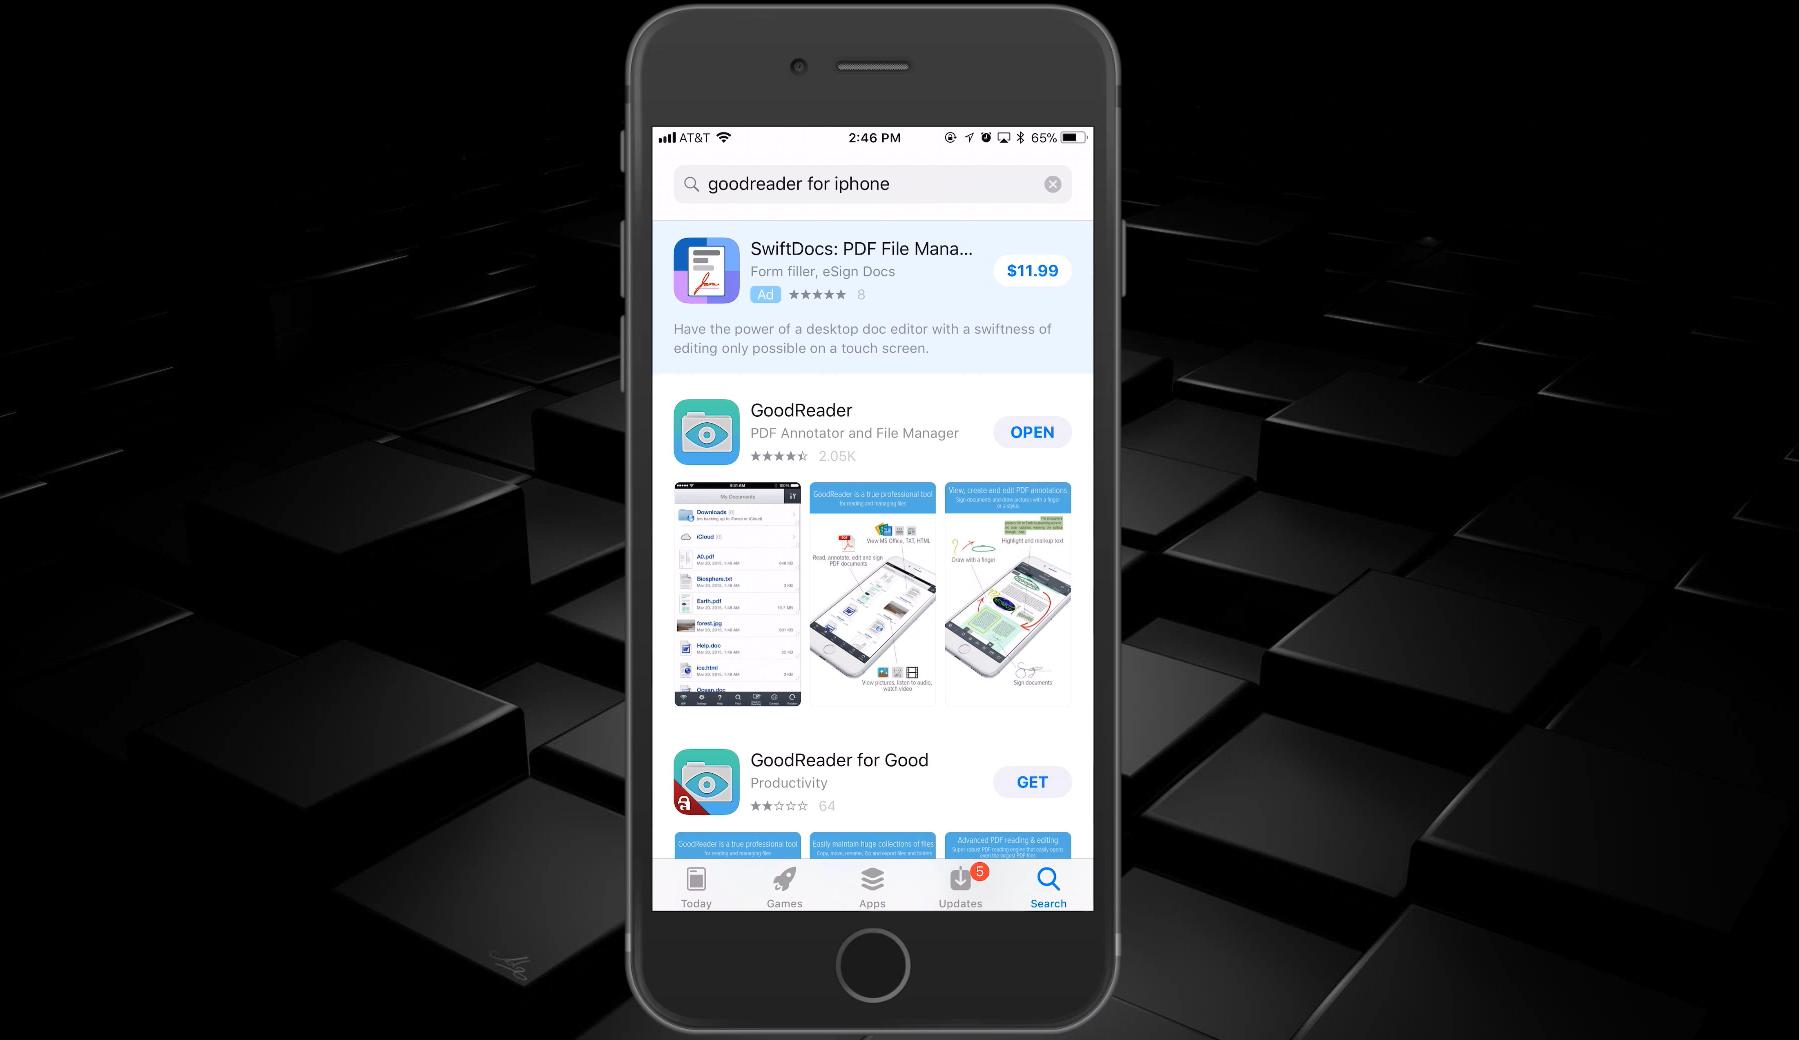 GoodReader iOS to WebDAV for PDF Editing – Gladinet